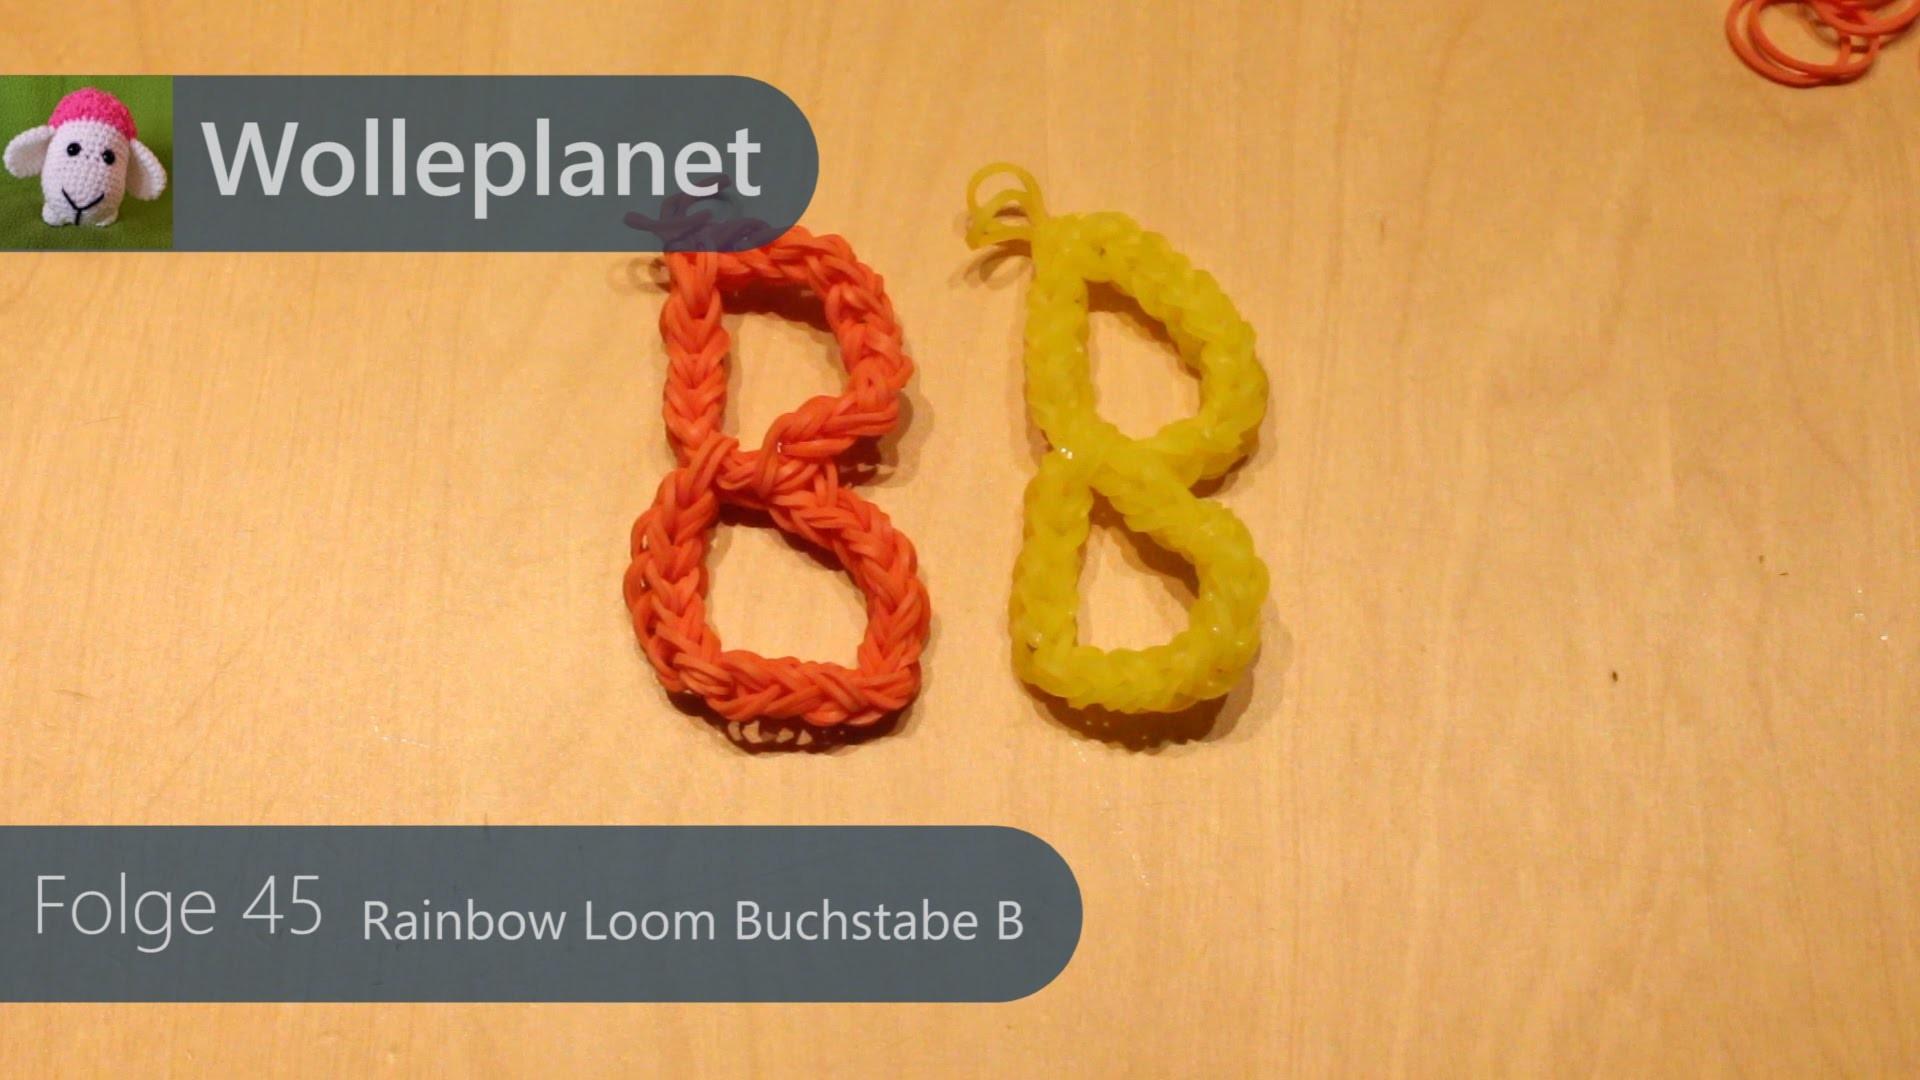 Rainbow Loom Buchstabe B mit Loom